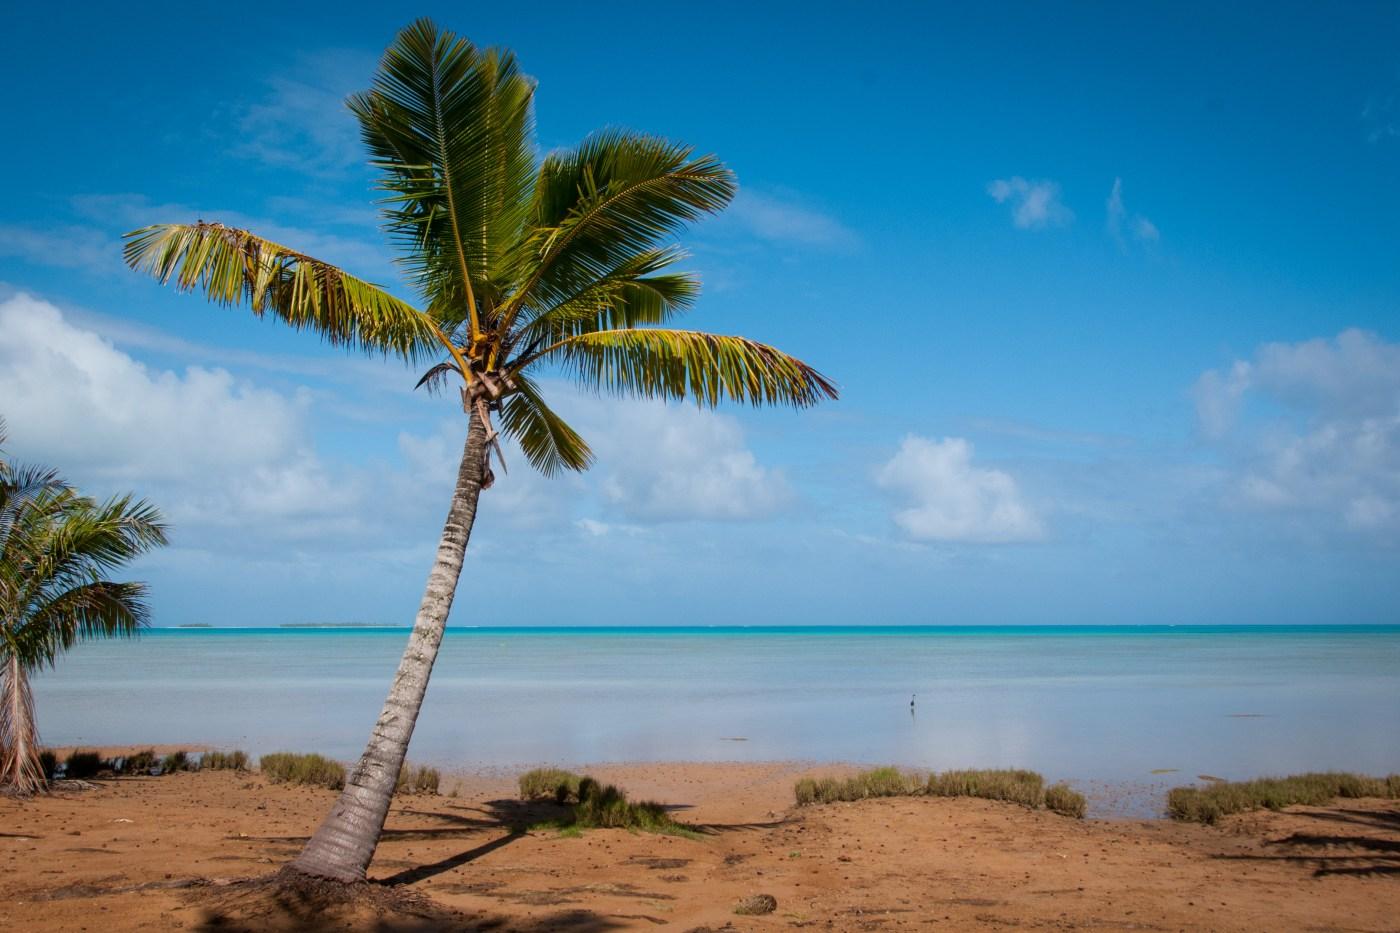 Palm Tree at Aitutaki lagoon, Cook Islands